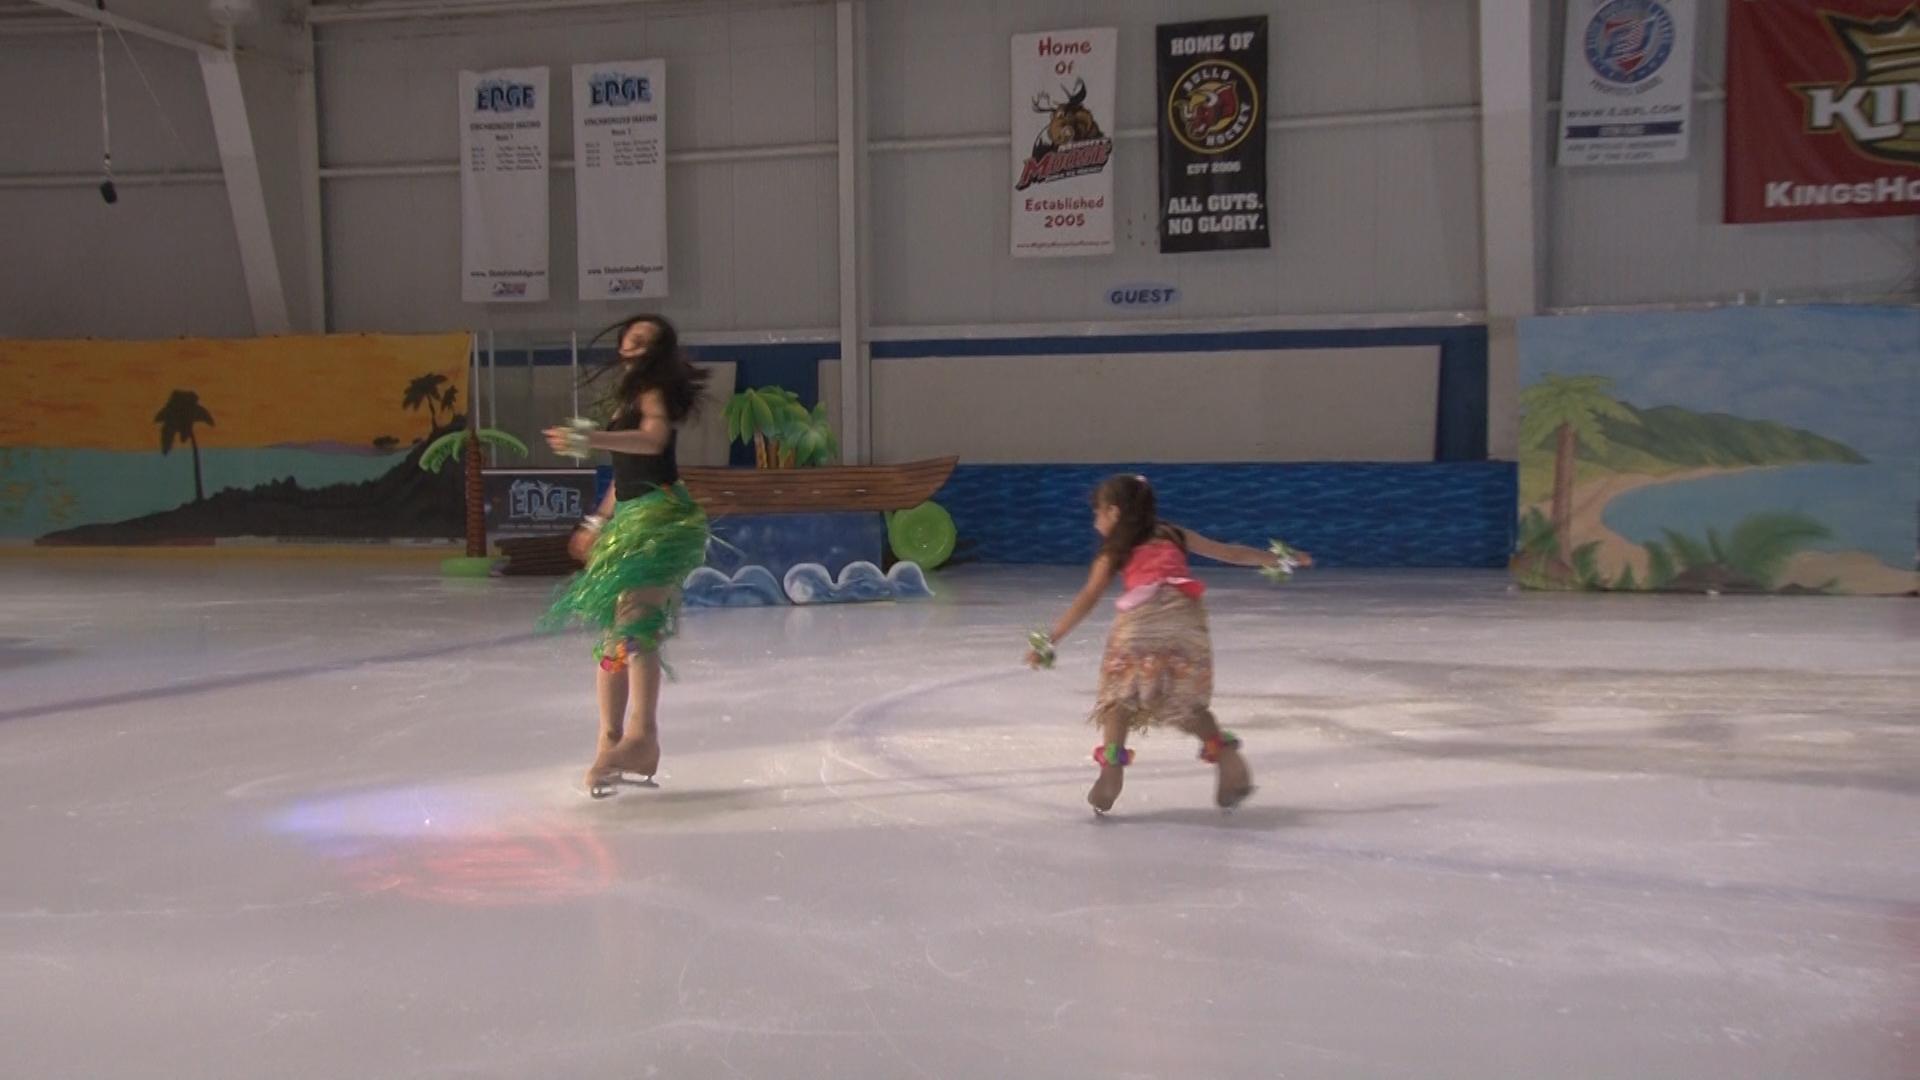 Power Play Maui Skate on Ice 071417.00_08_34_24.Still012.jpg